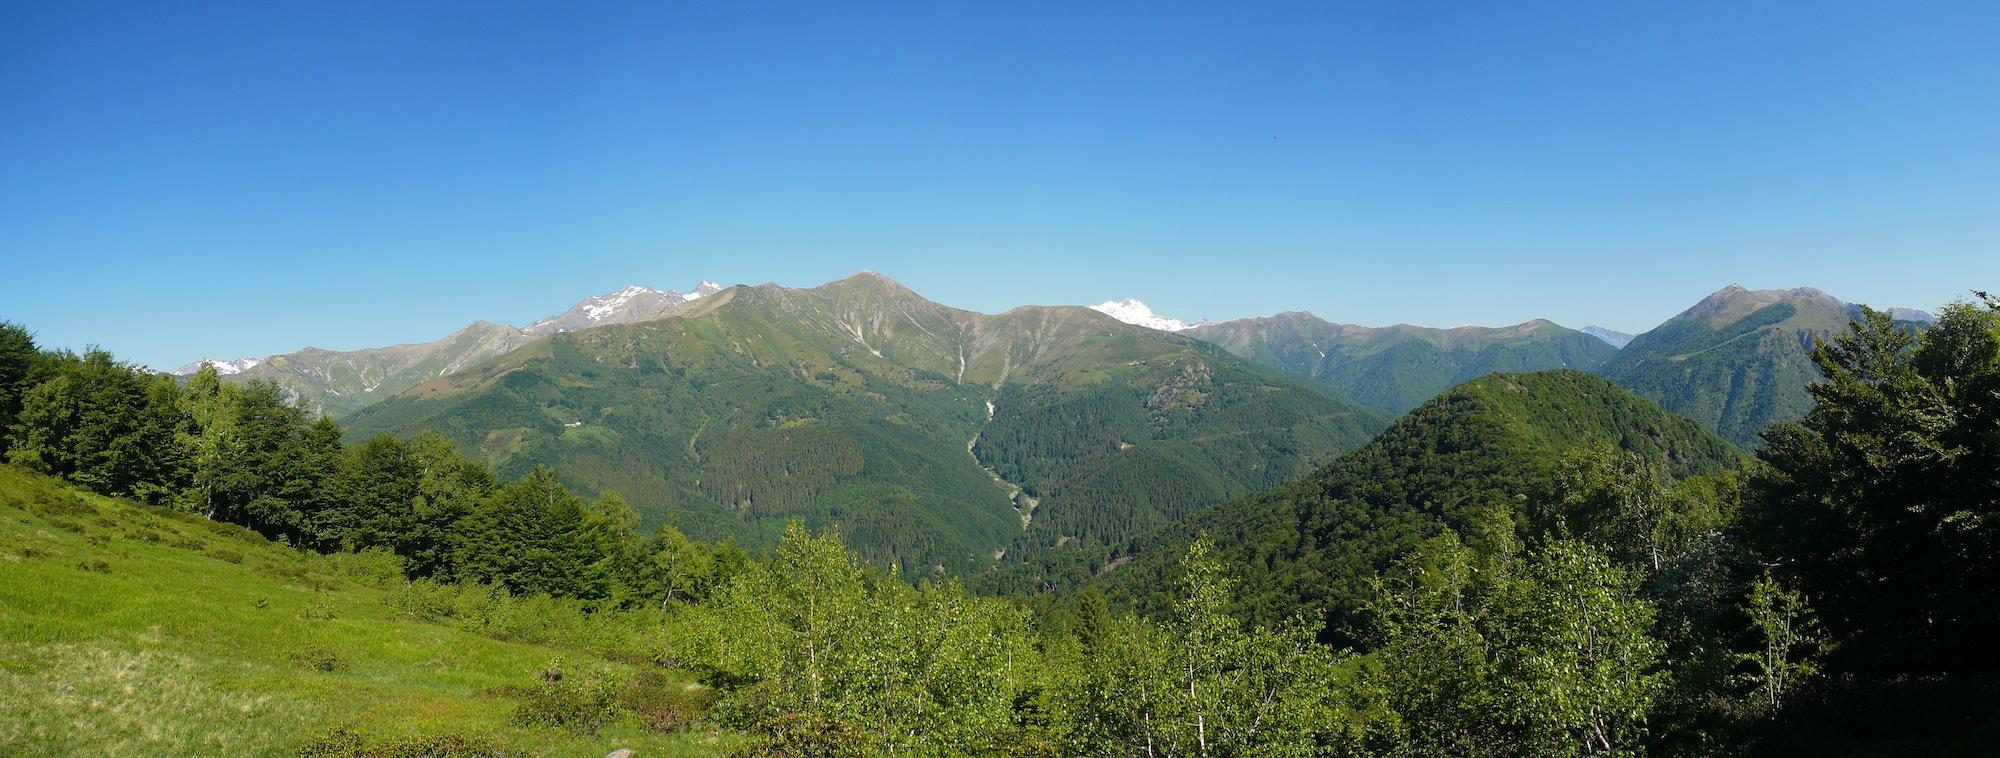 Valsessera - montagna biellese